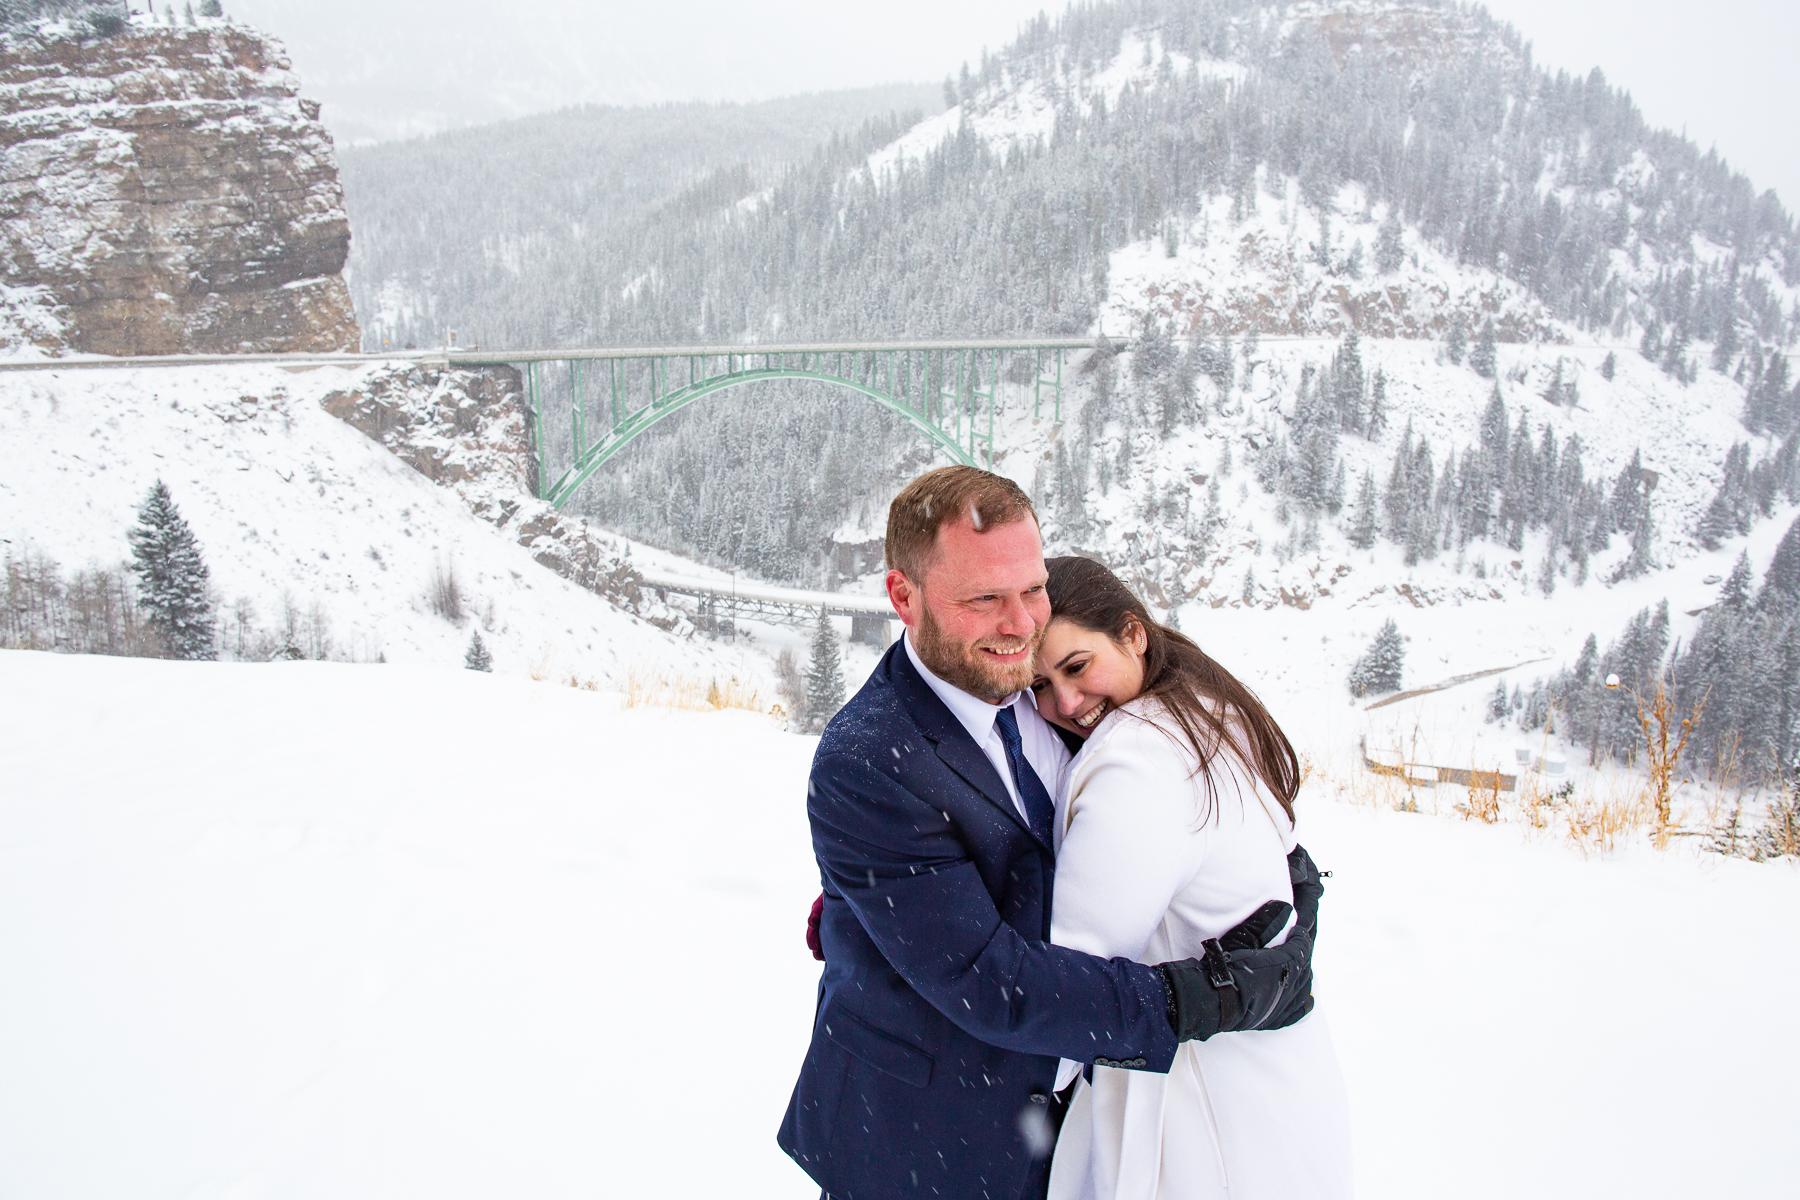 Twin Lakes Wedding Photographers, Colorado | The blizzard raged around them